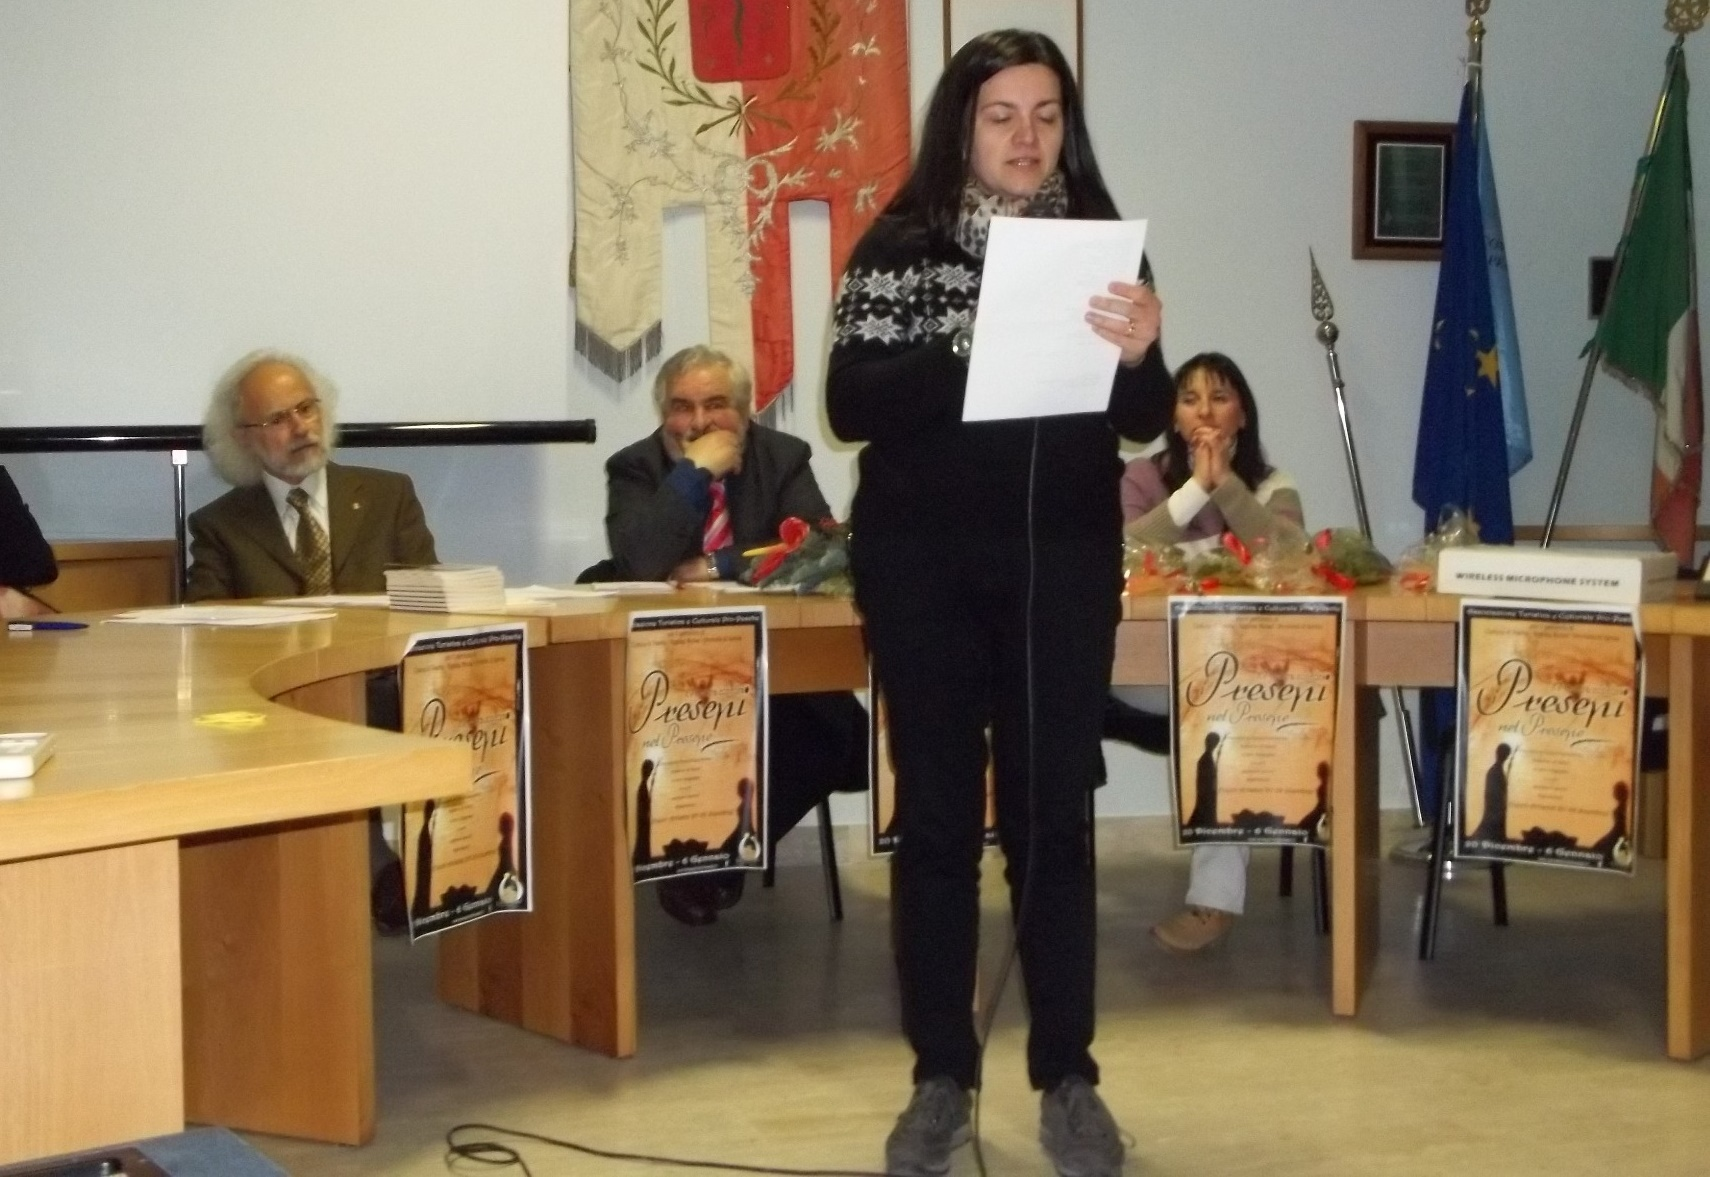 Federica Passarelli